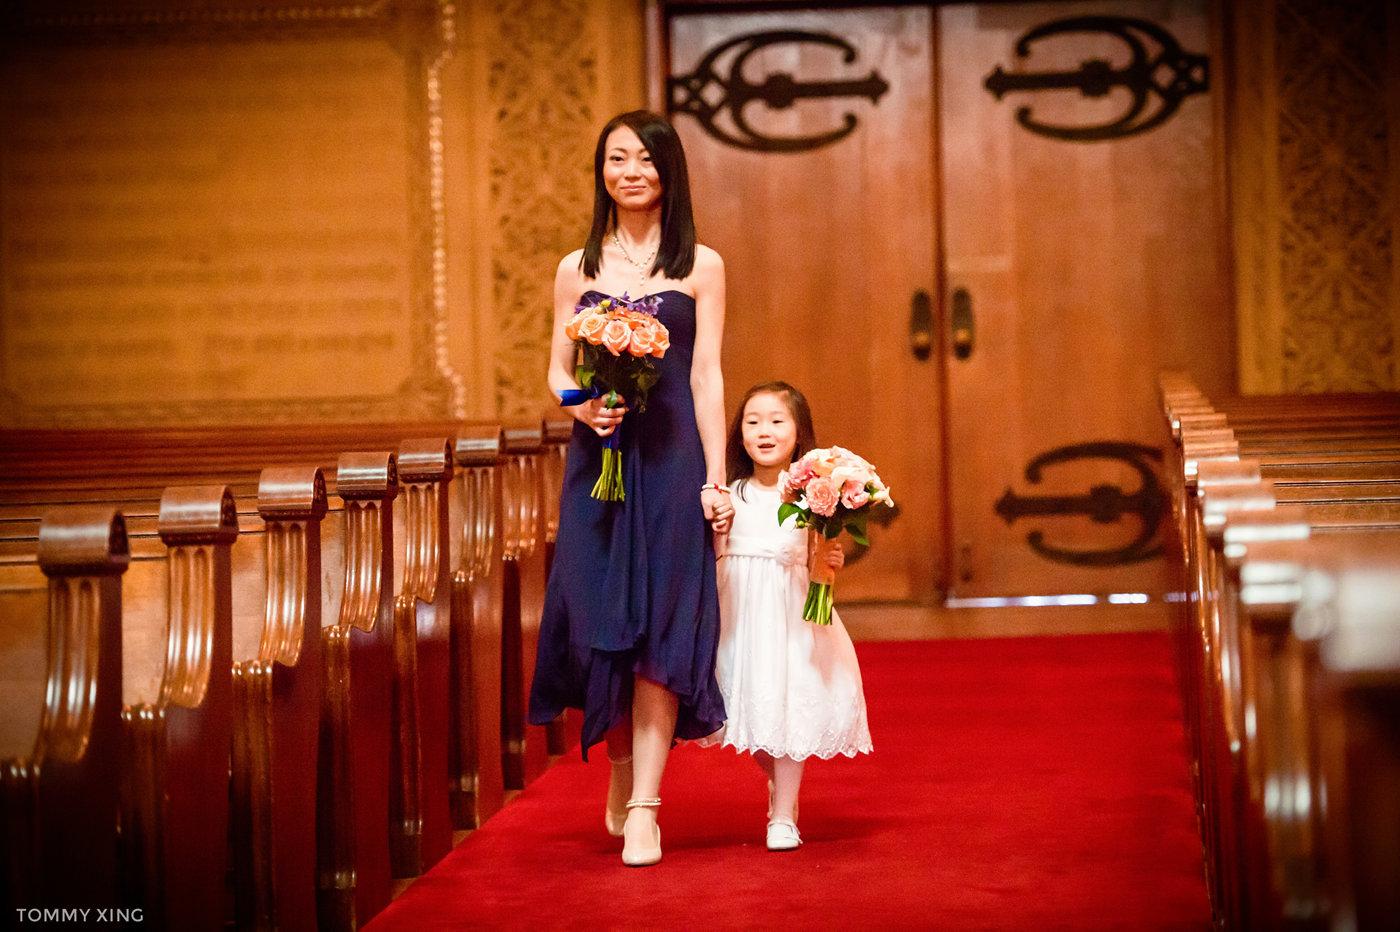 STANFORD MEMORIAL CHURCH WEDDING - Wenjie & Chengcheng - SAN FRANCISCO BAY AREA 斯坦福教堂婚礼跟拍 - 洛杉矶婚礼婚纱照摄影师 Tommy Xing Photography067.jpg